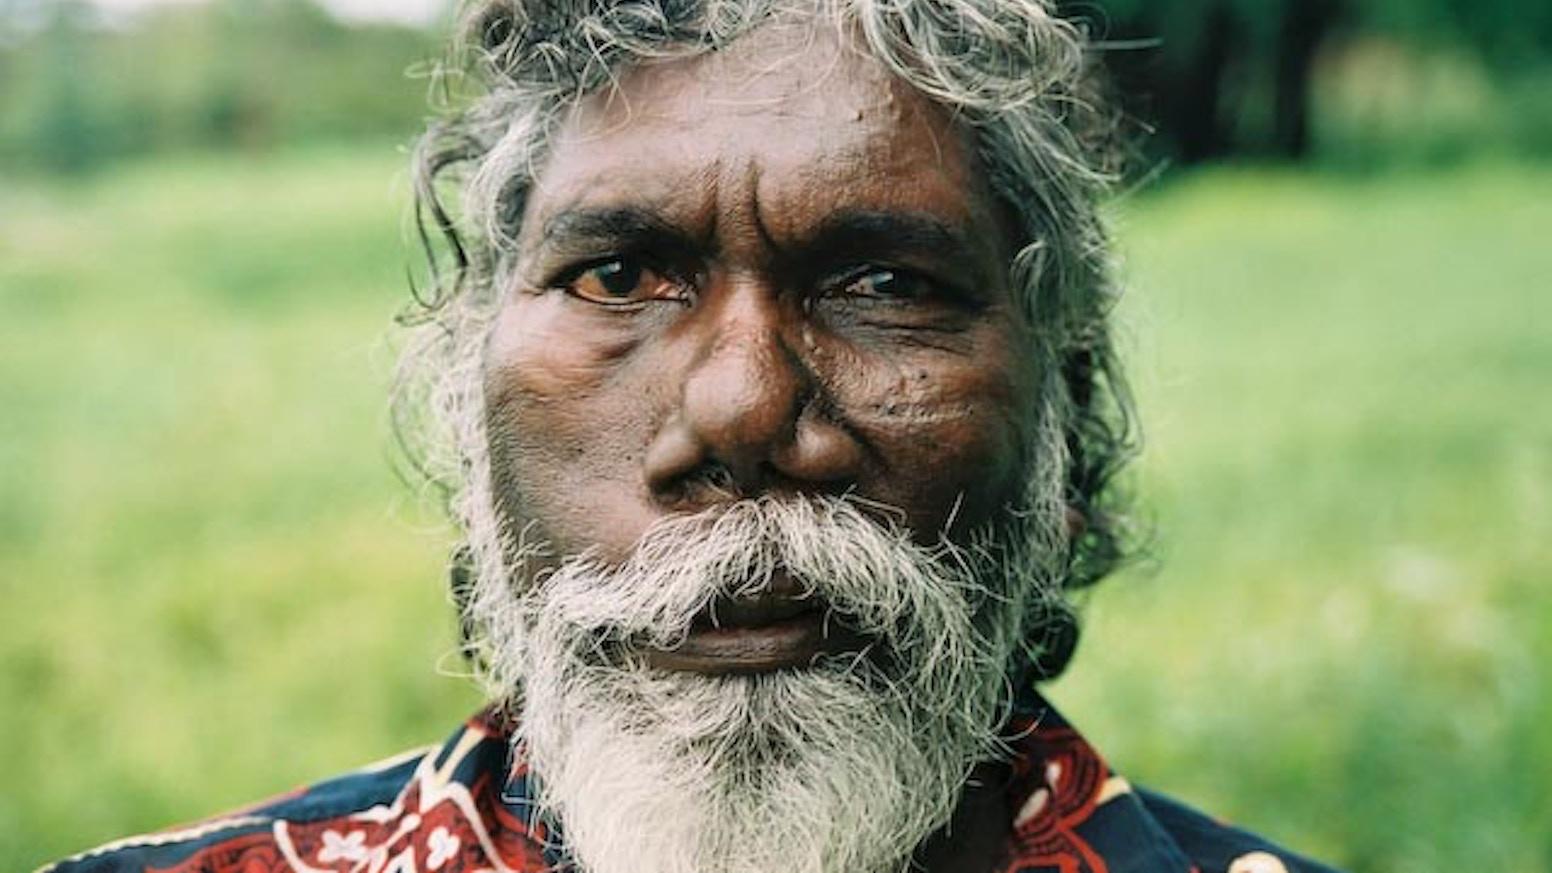 Against all odds, Djalu Gurruwiwi, spiritual custodian for the didjeridu (yirdaki), battles to preserve his sacred music and culture.